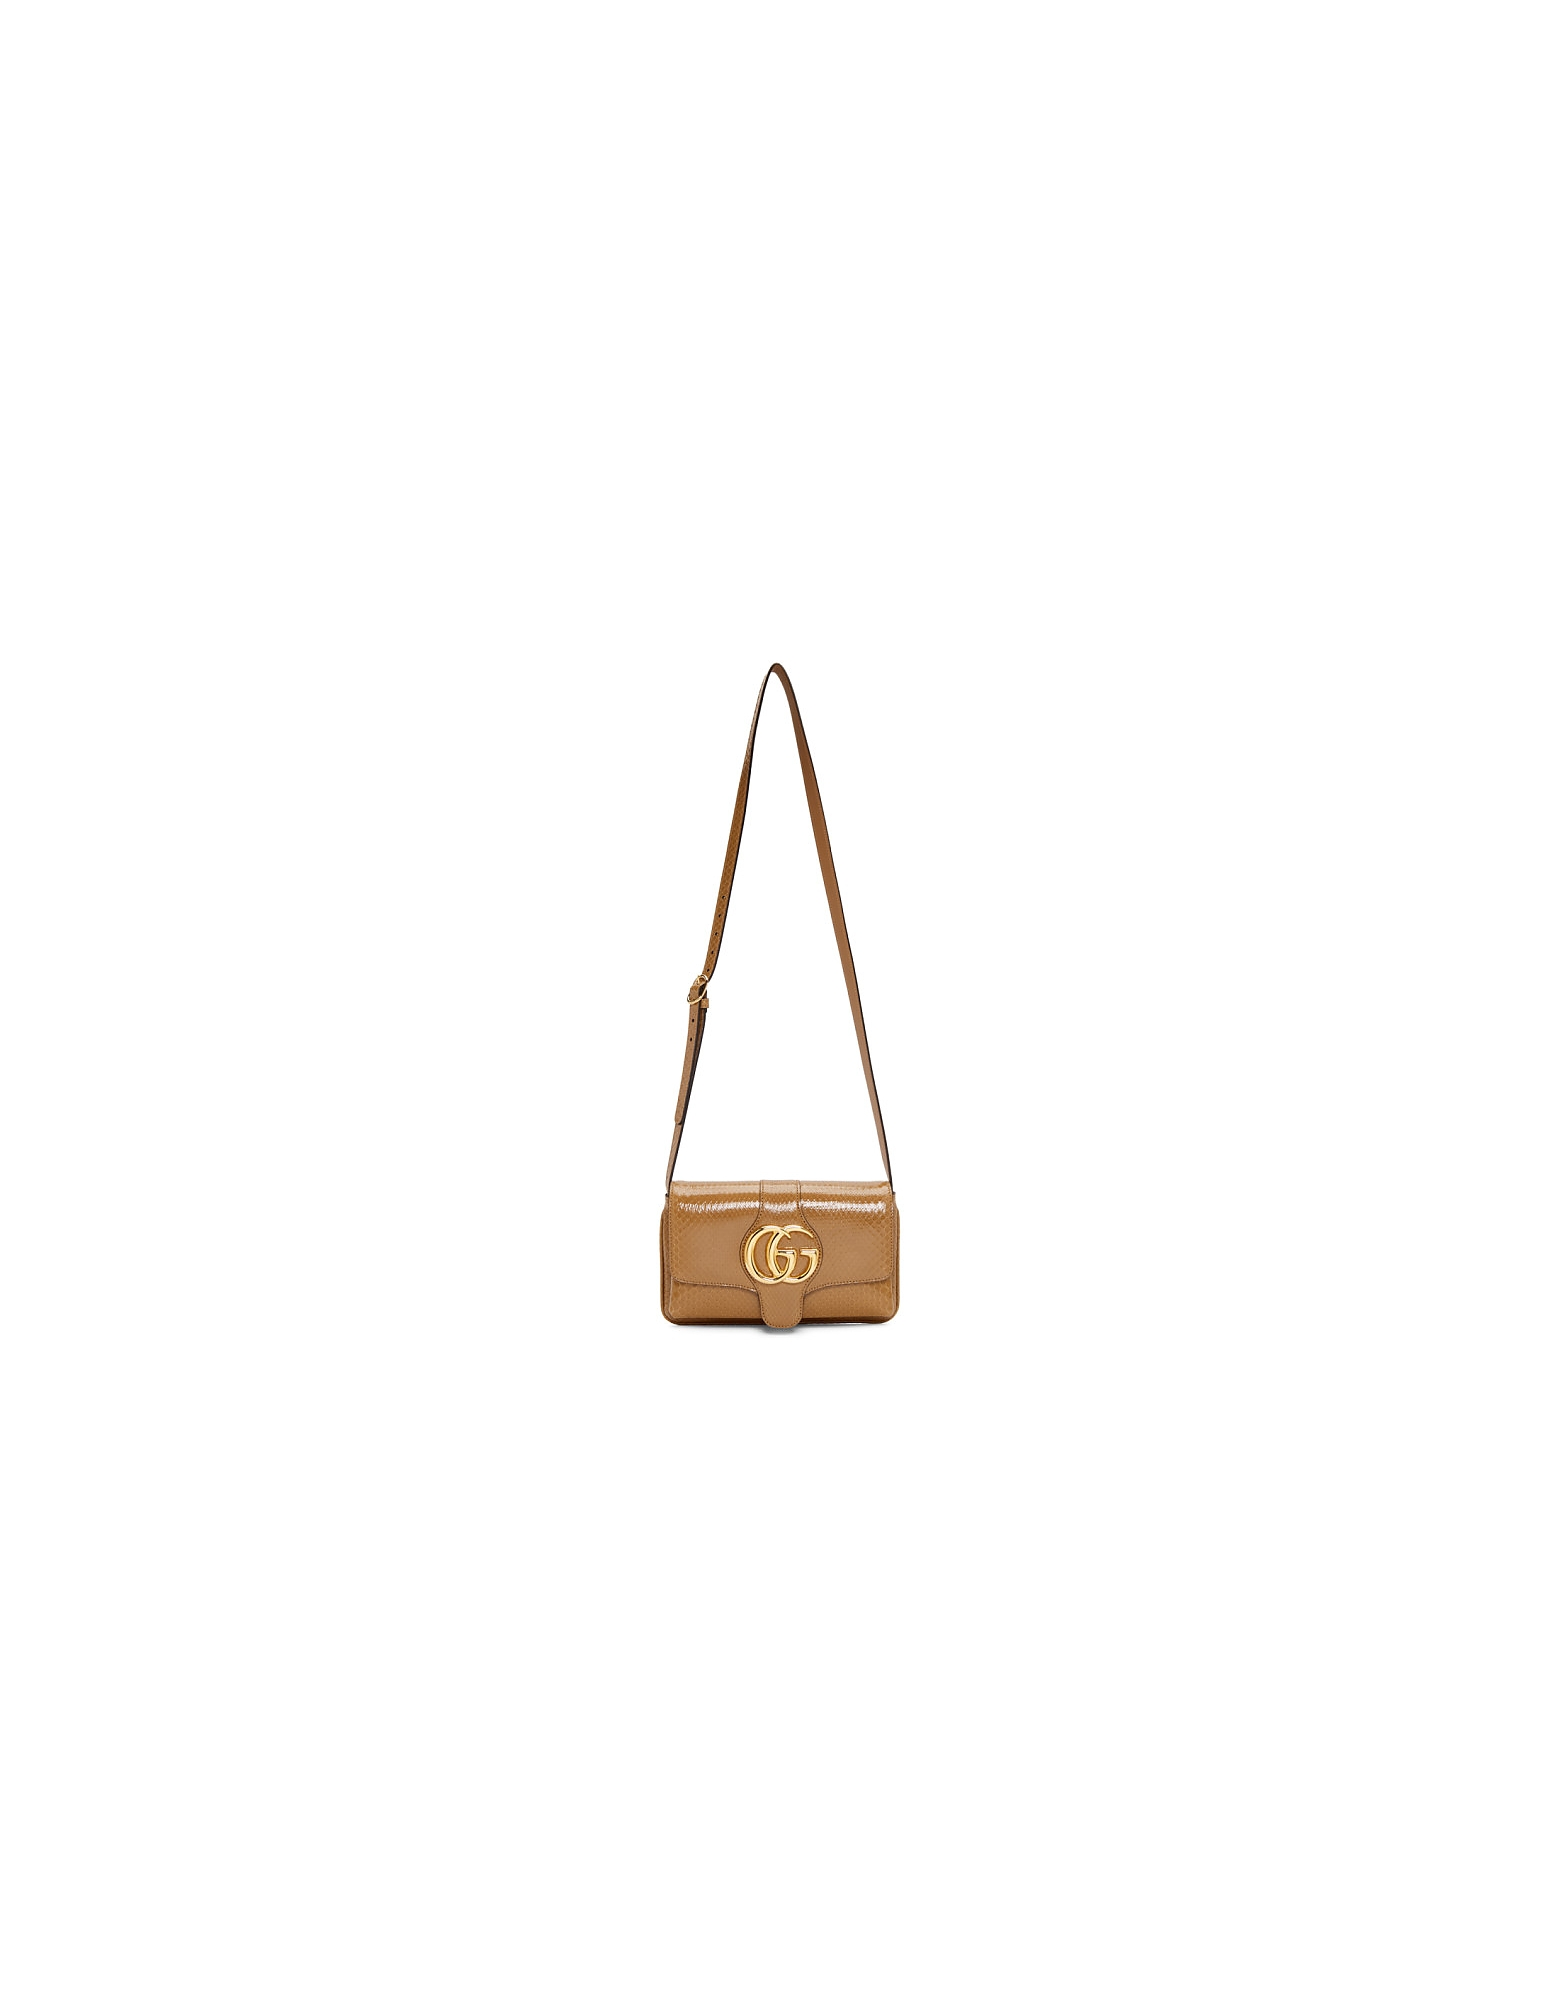 Gucci Designer Handbags, Taupe Snake Small Arli Shoulder Bag